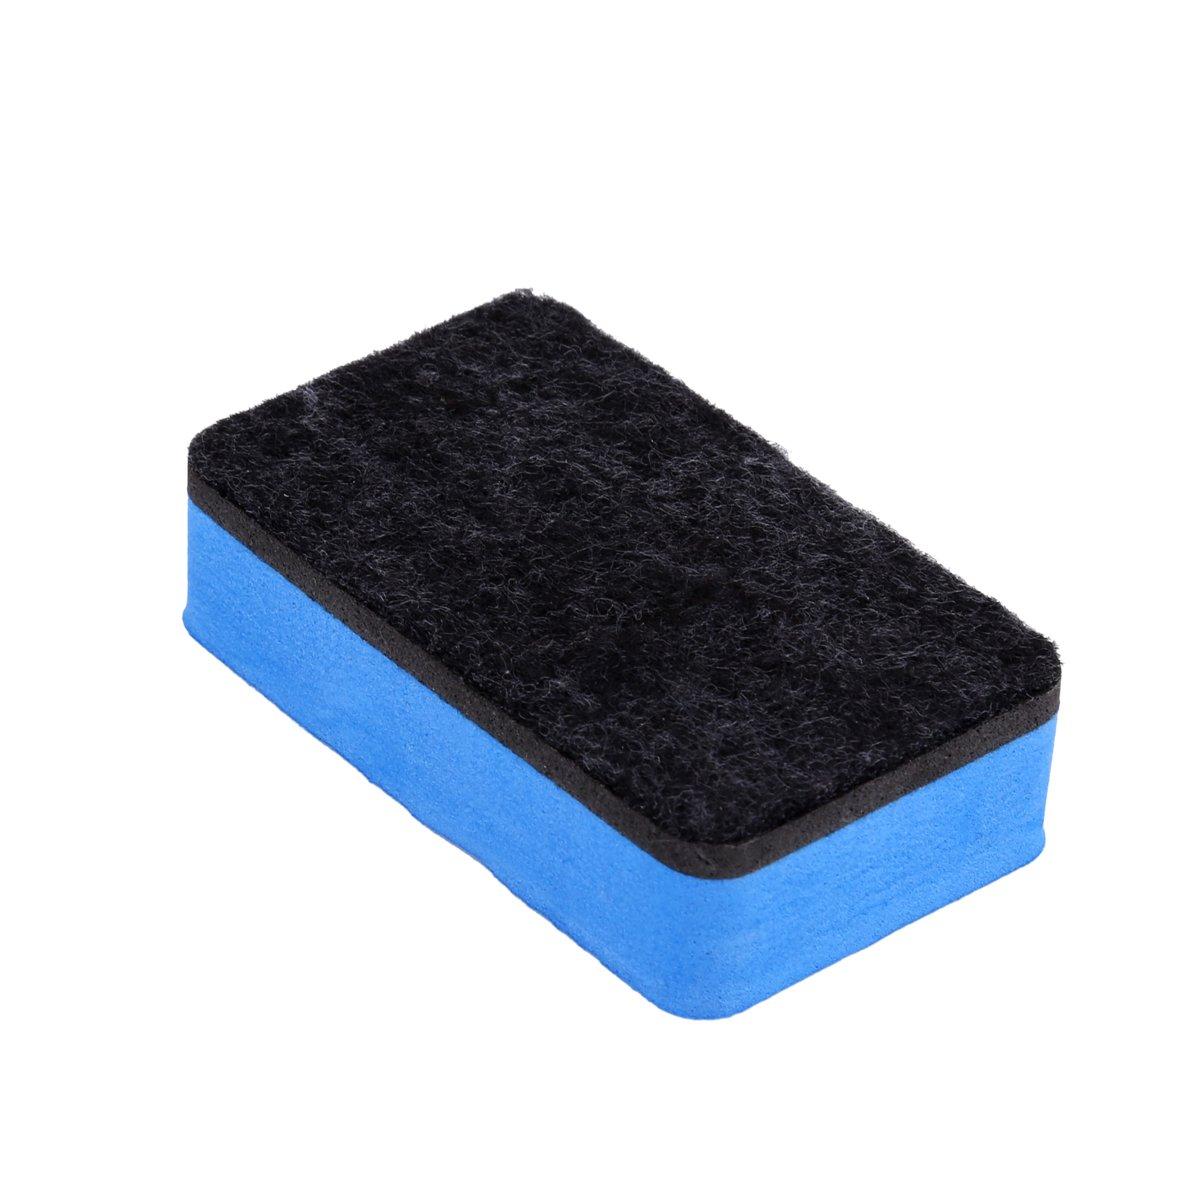 Carpeta con l/ápices BizoeRade Carpeta T/áctica con Deportes Cron/ómetro,Professional F/útbol Coach Board Cron/ómetro digital imanes goma de borrar